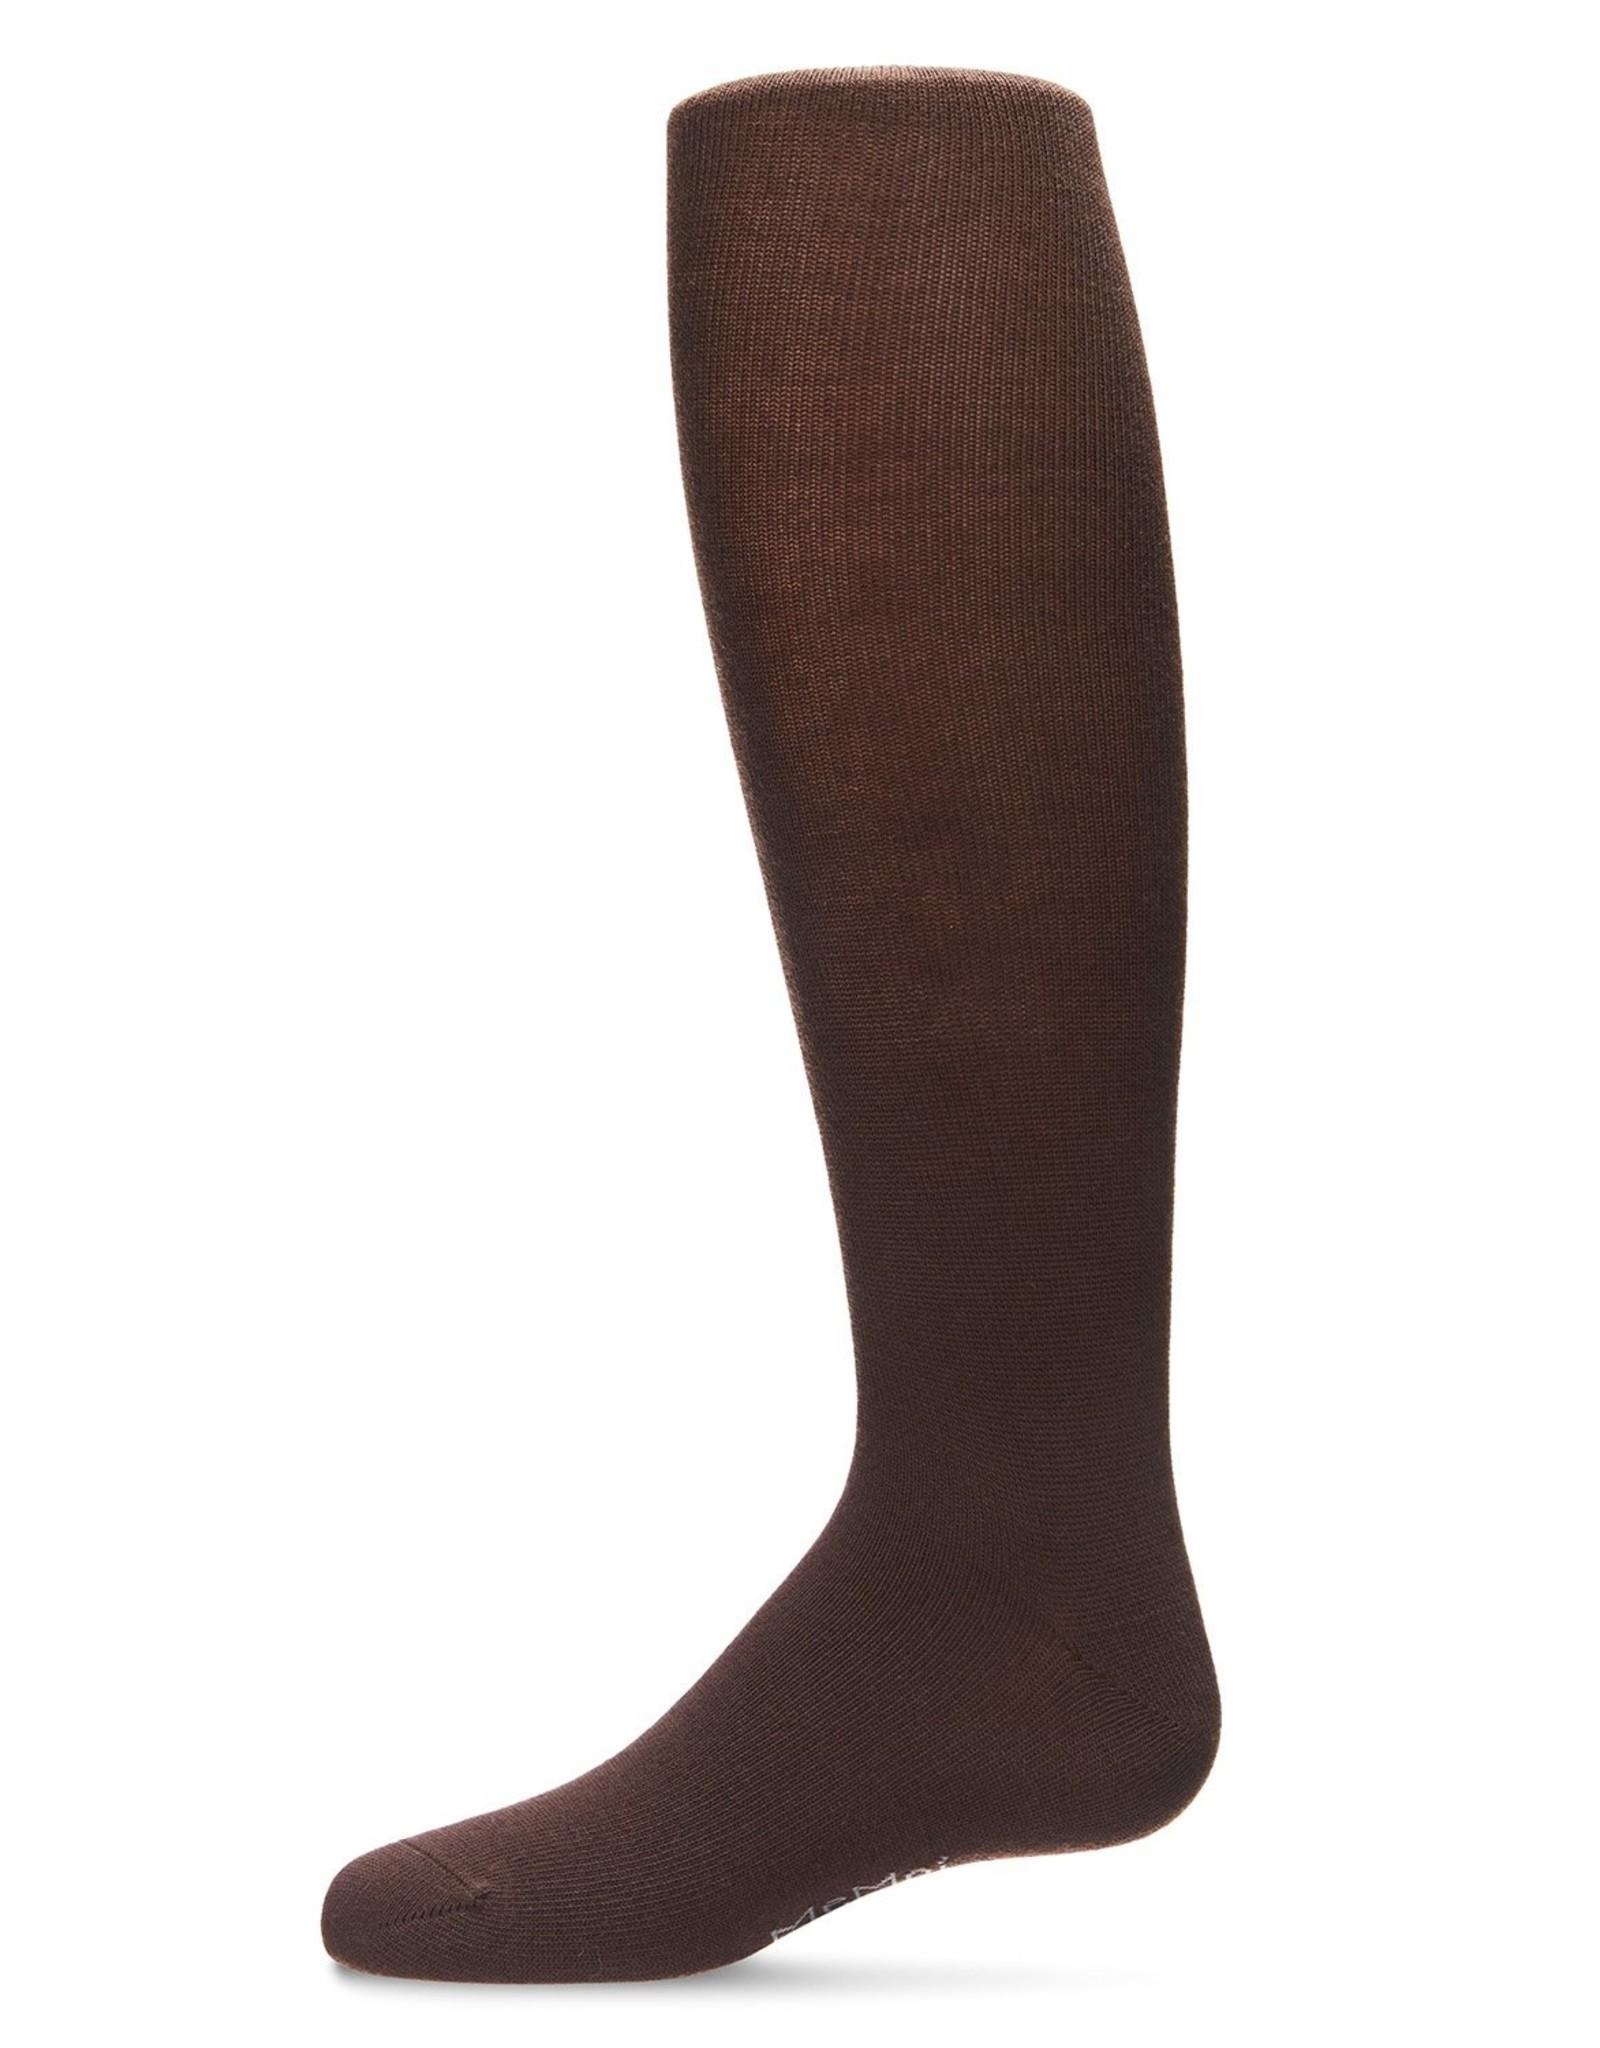 Memoi Memoi Cotton Knee Socks Fashion Colors FW21